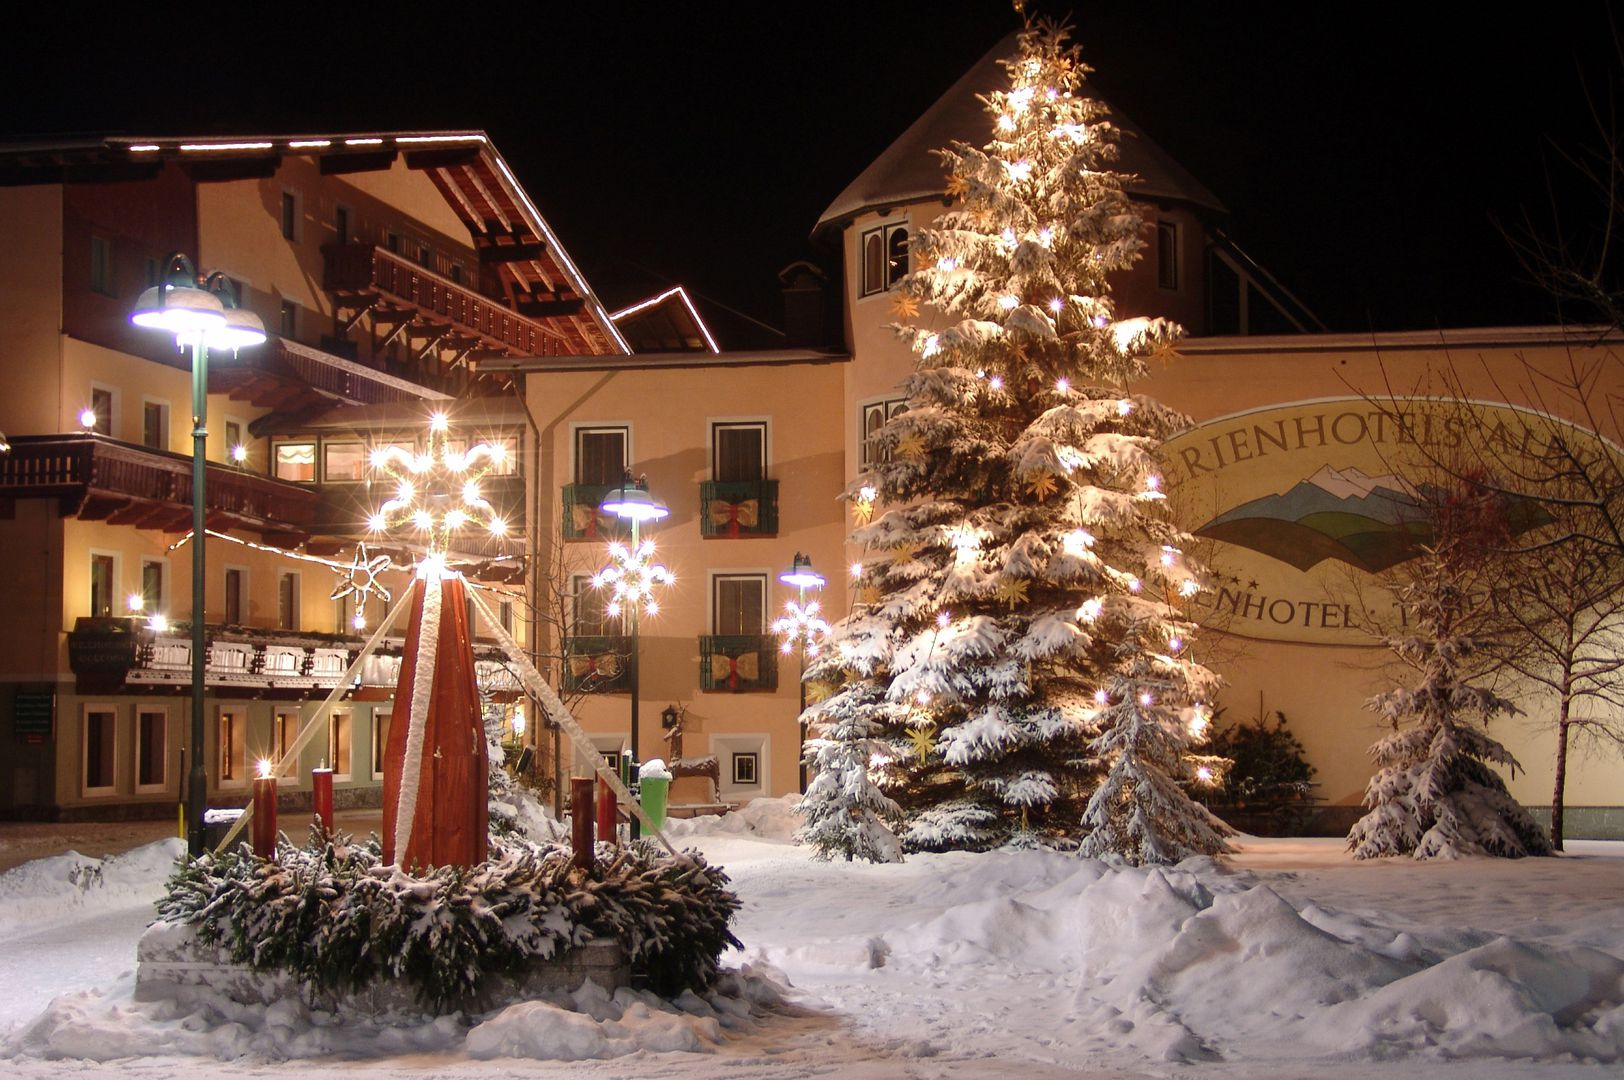 Feriehotel Alber Alpen...